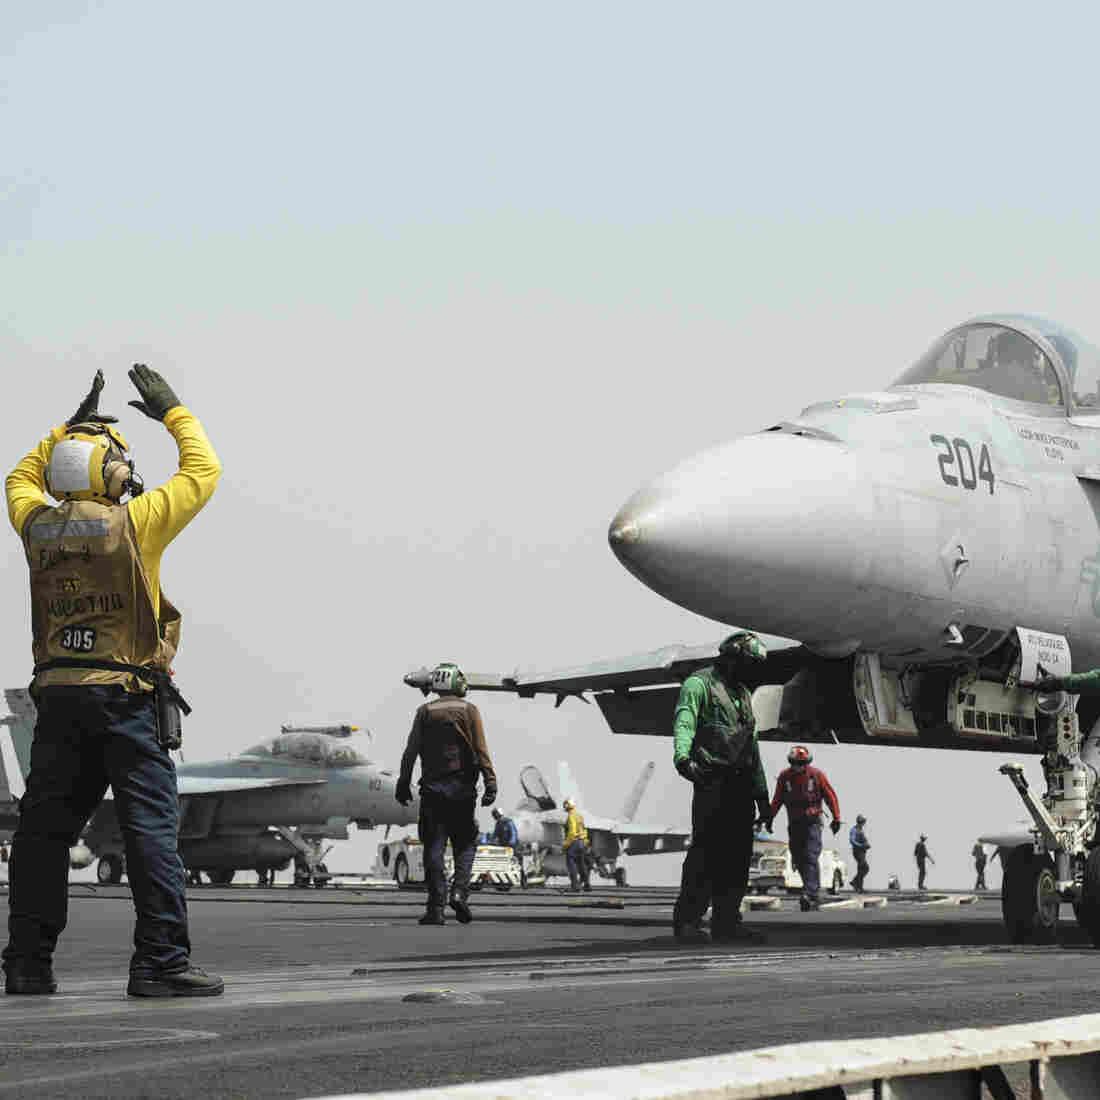 Report: 'Iran Plots Revenge' If U.S. Strikes Syria